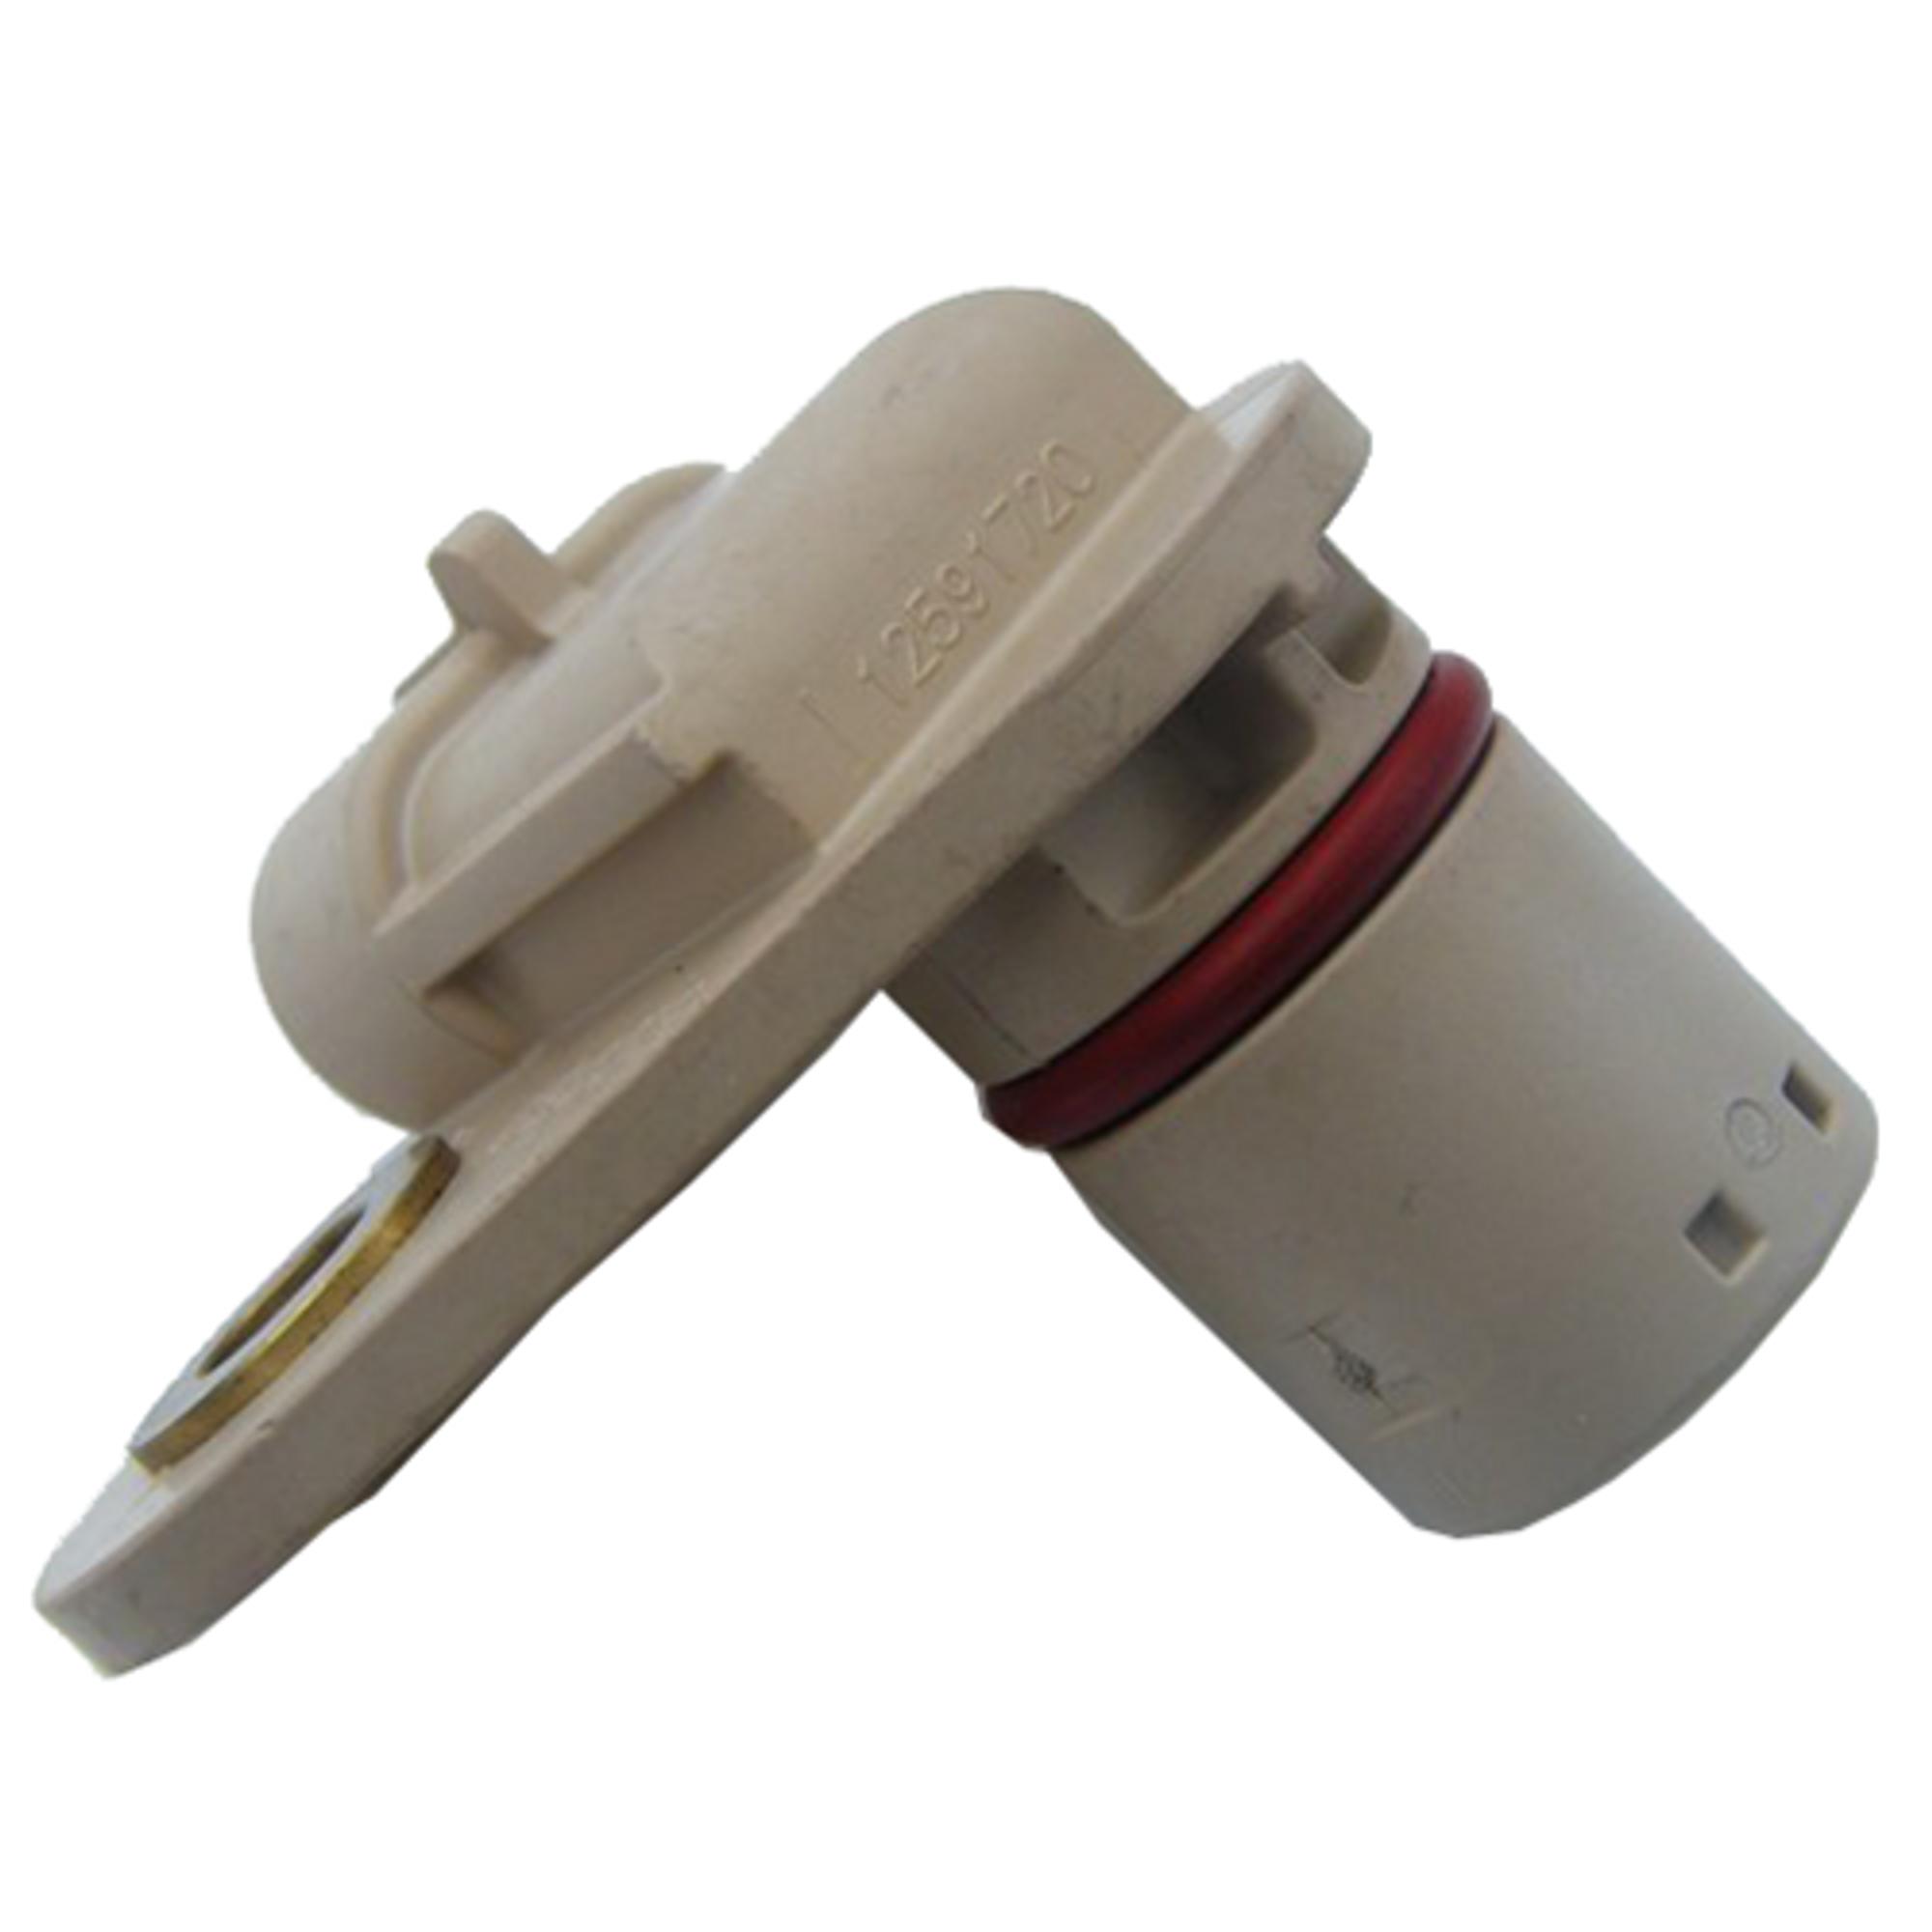 GM Camshaft Sensor For LS2 LS3 And LS7